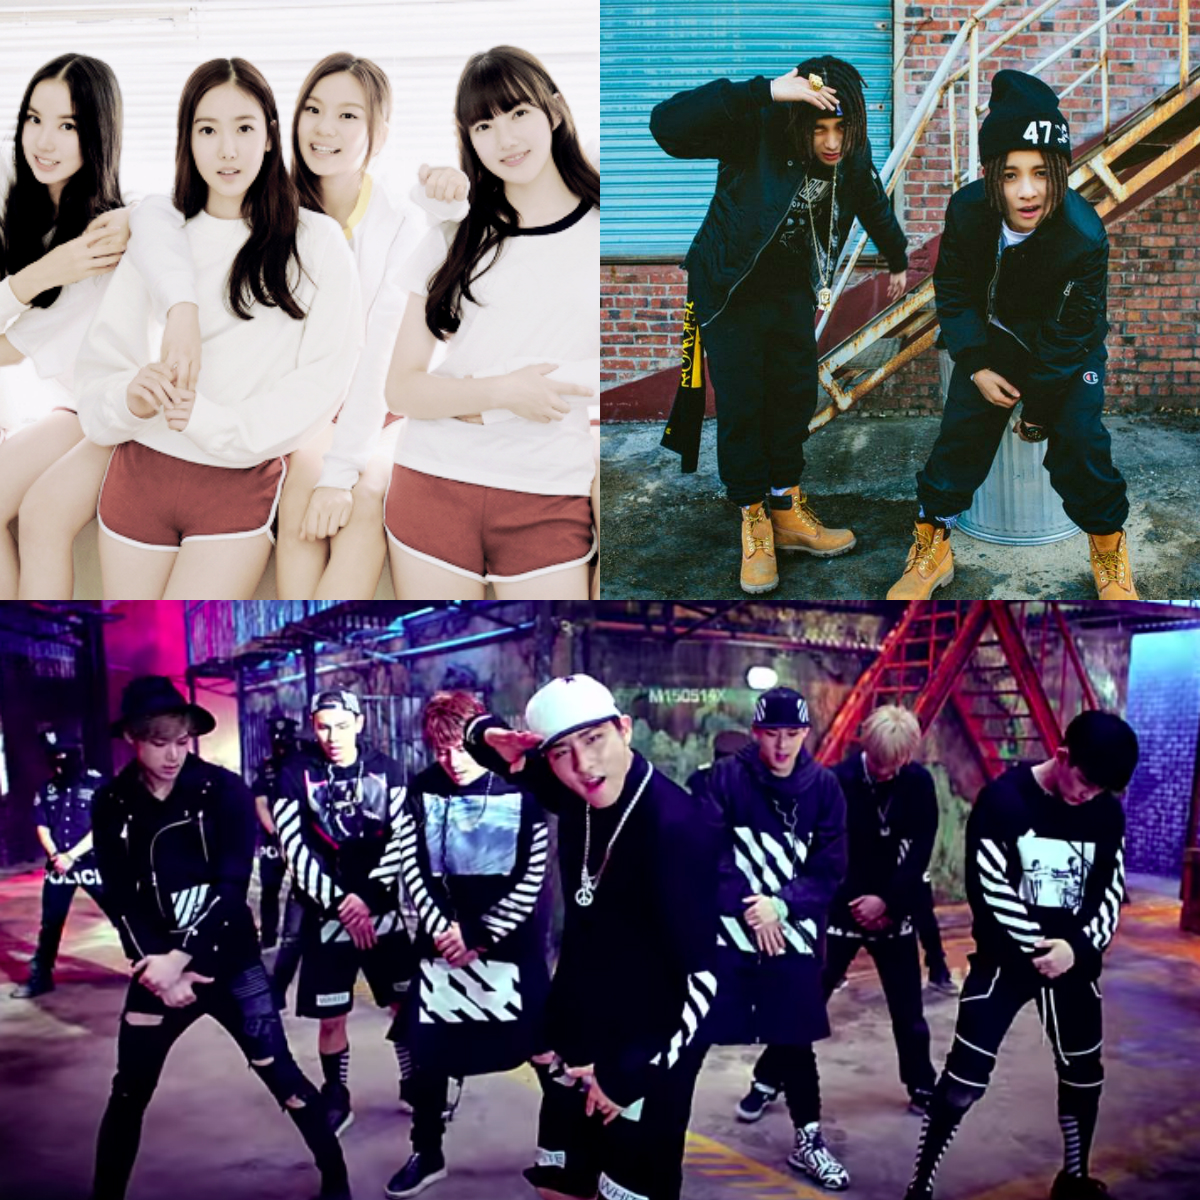 Debuting Kpop acts